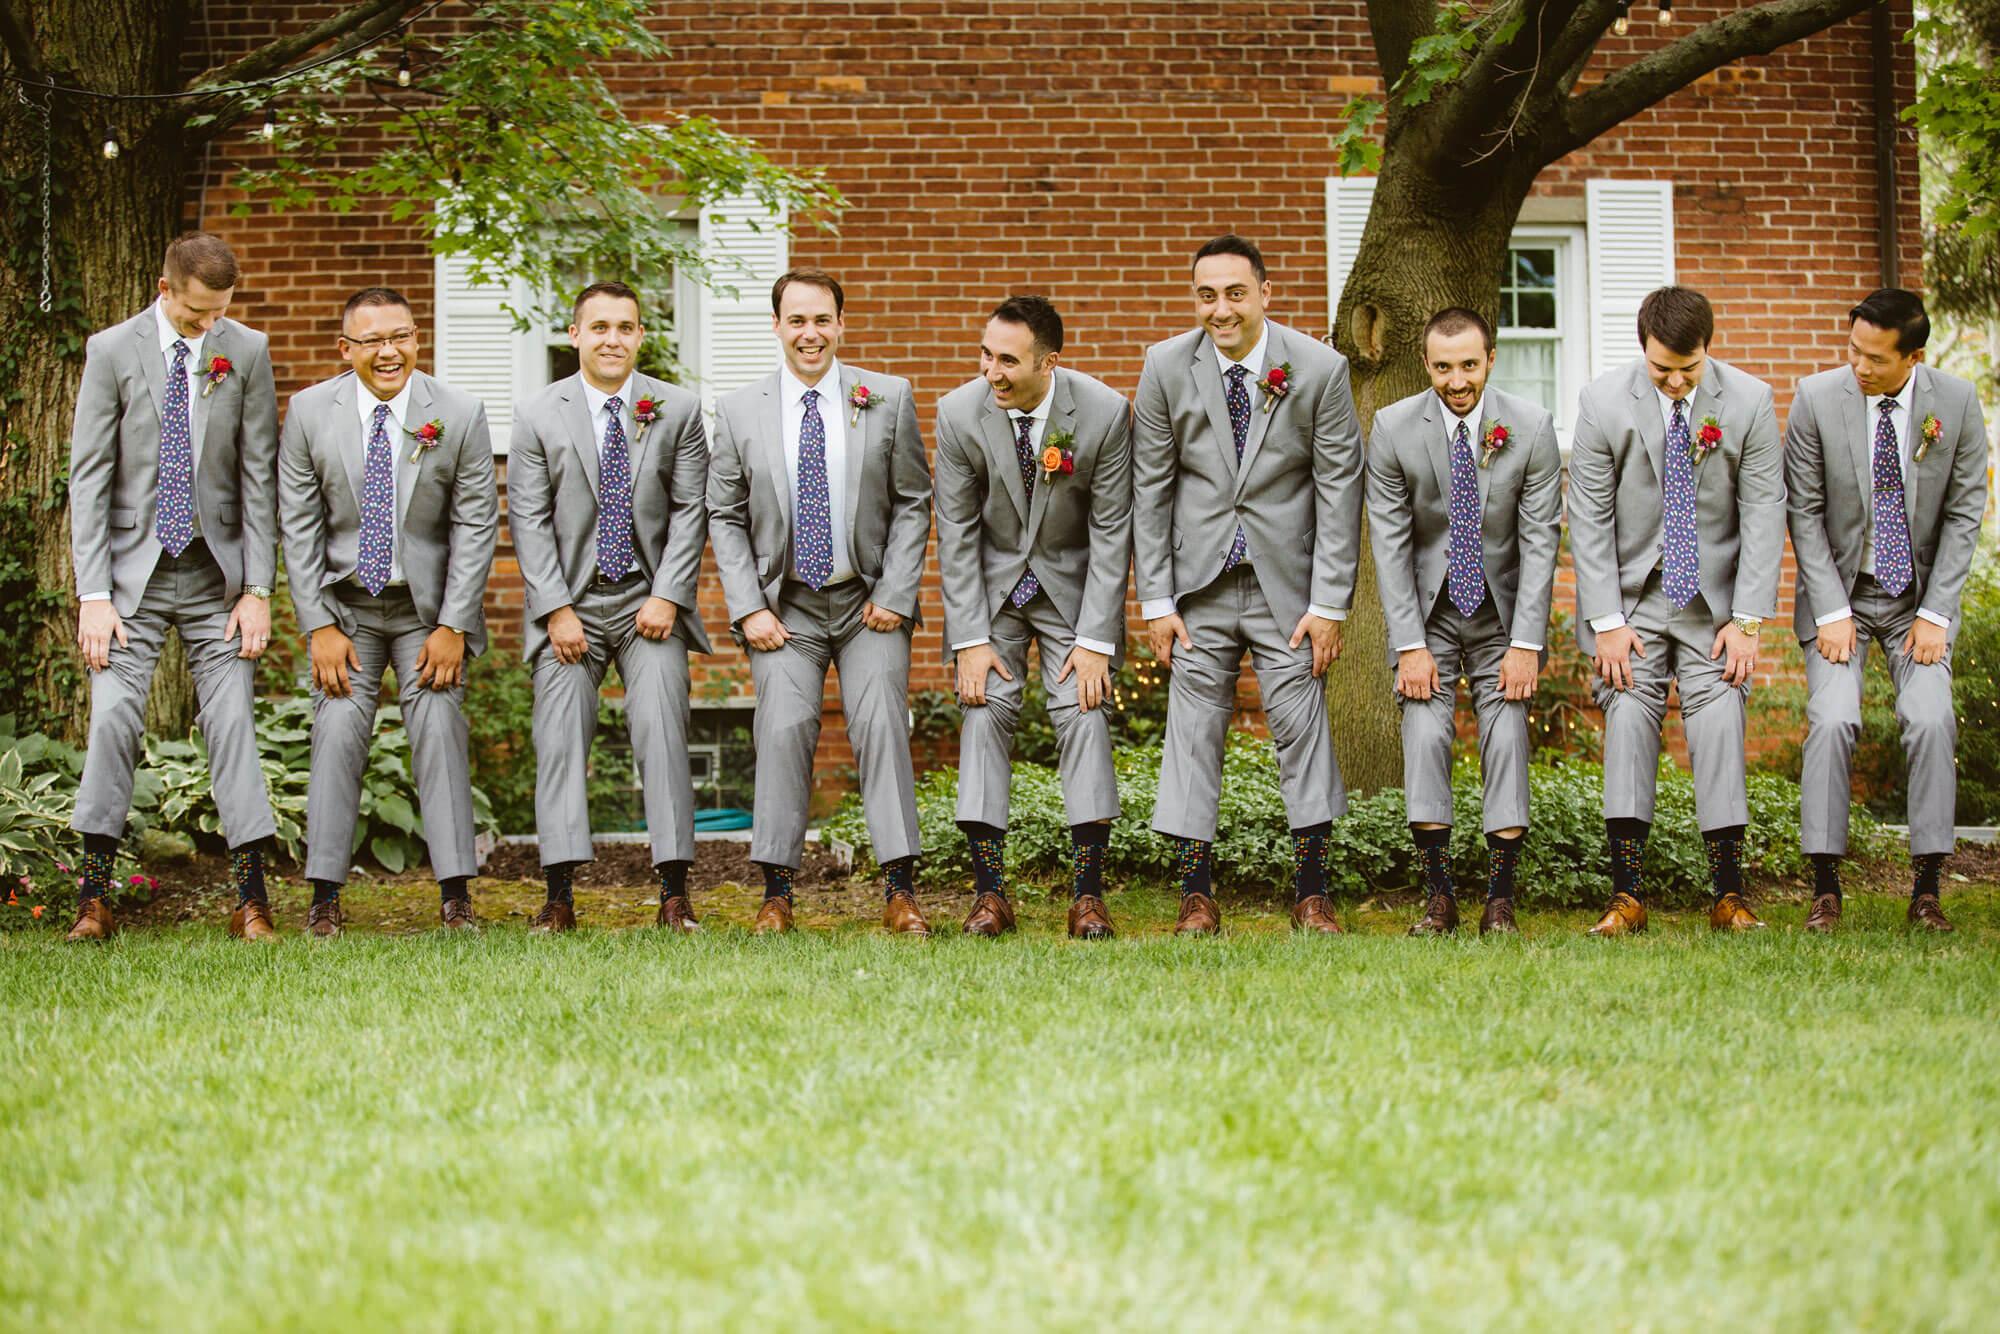 Erica-Kay-Photography---Kate-_-Joe-Wedding-3.jpg